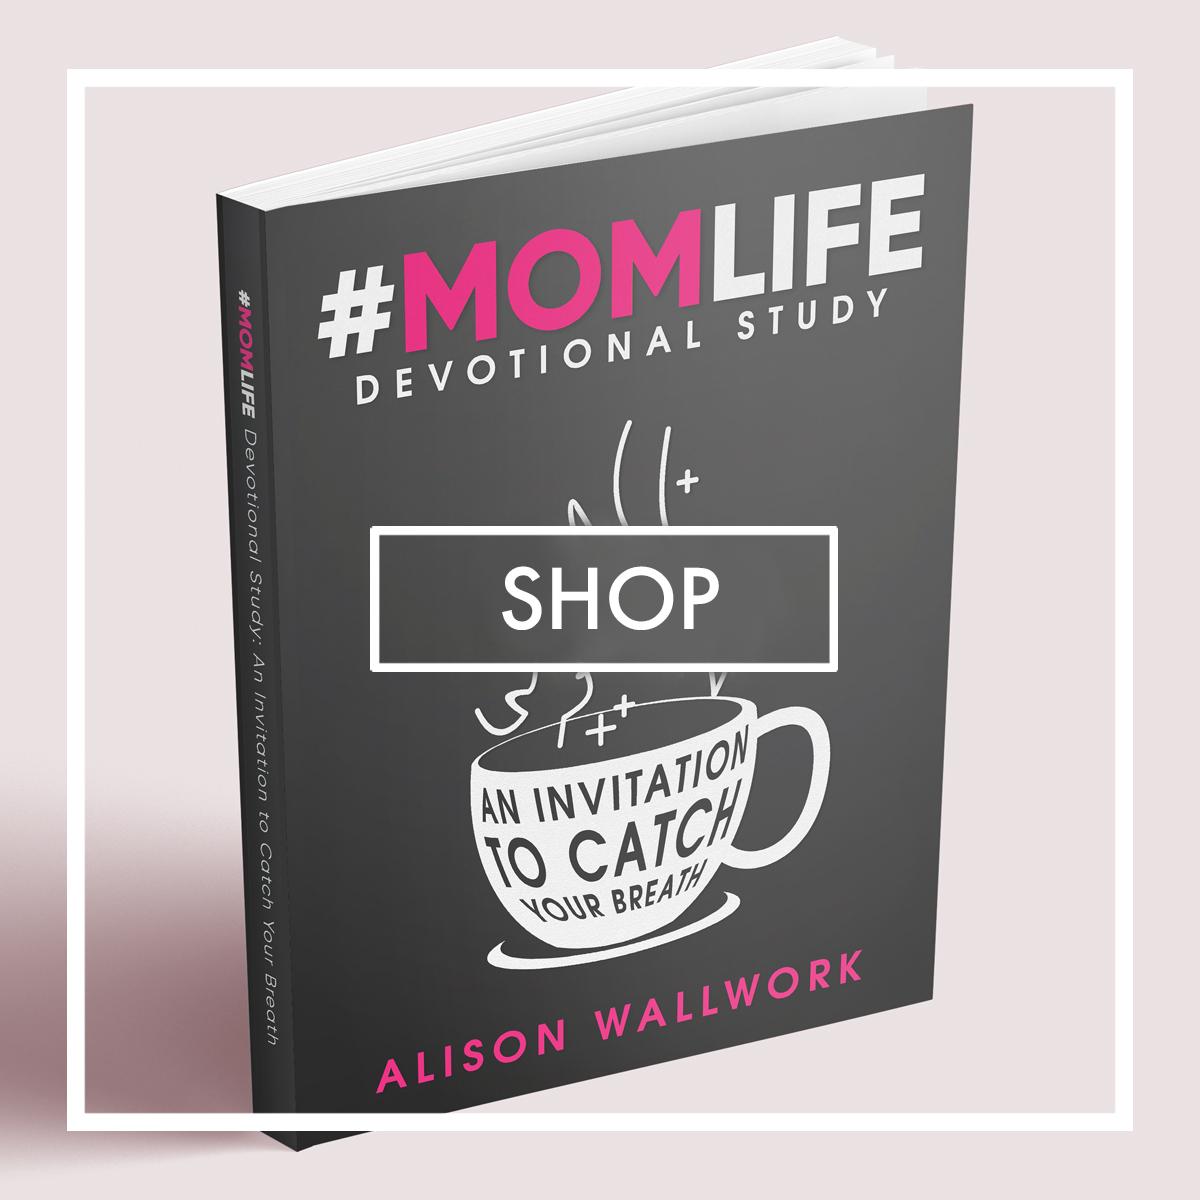 SHOP-ALISON-WALLWORK-AUTHOR-MOMLIFE-BOOK.jpg